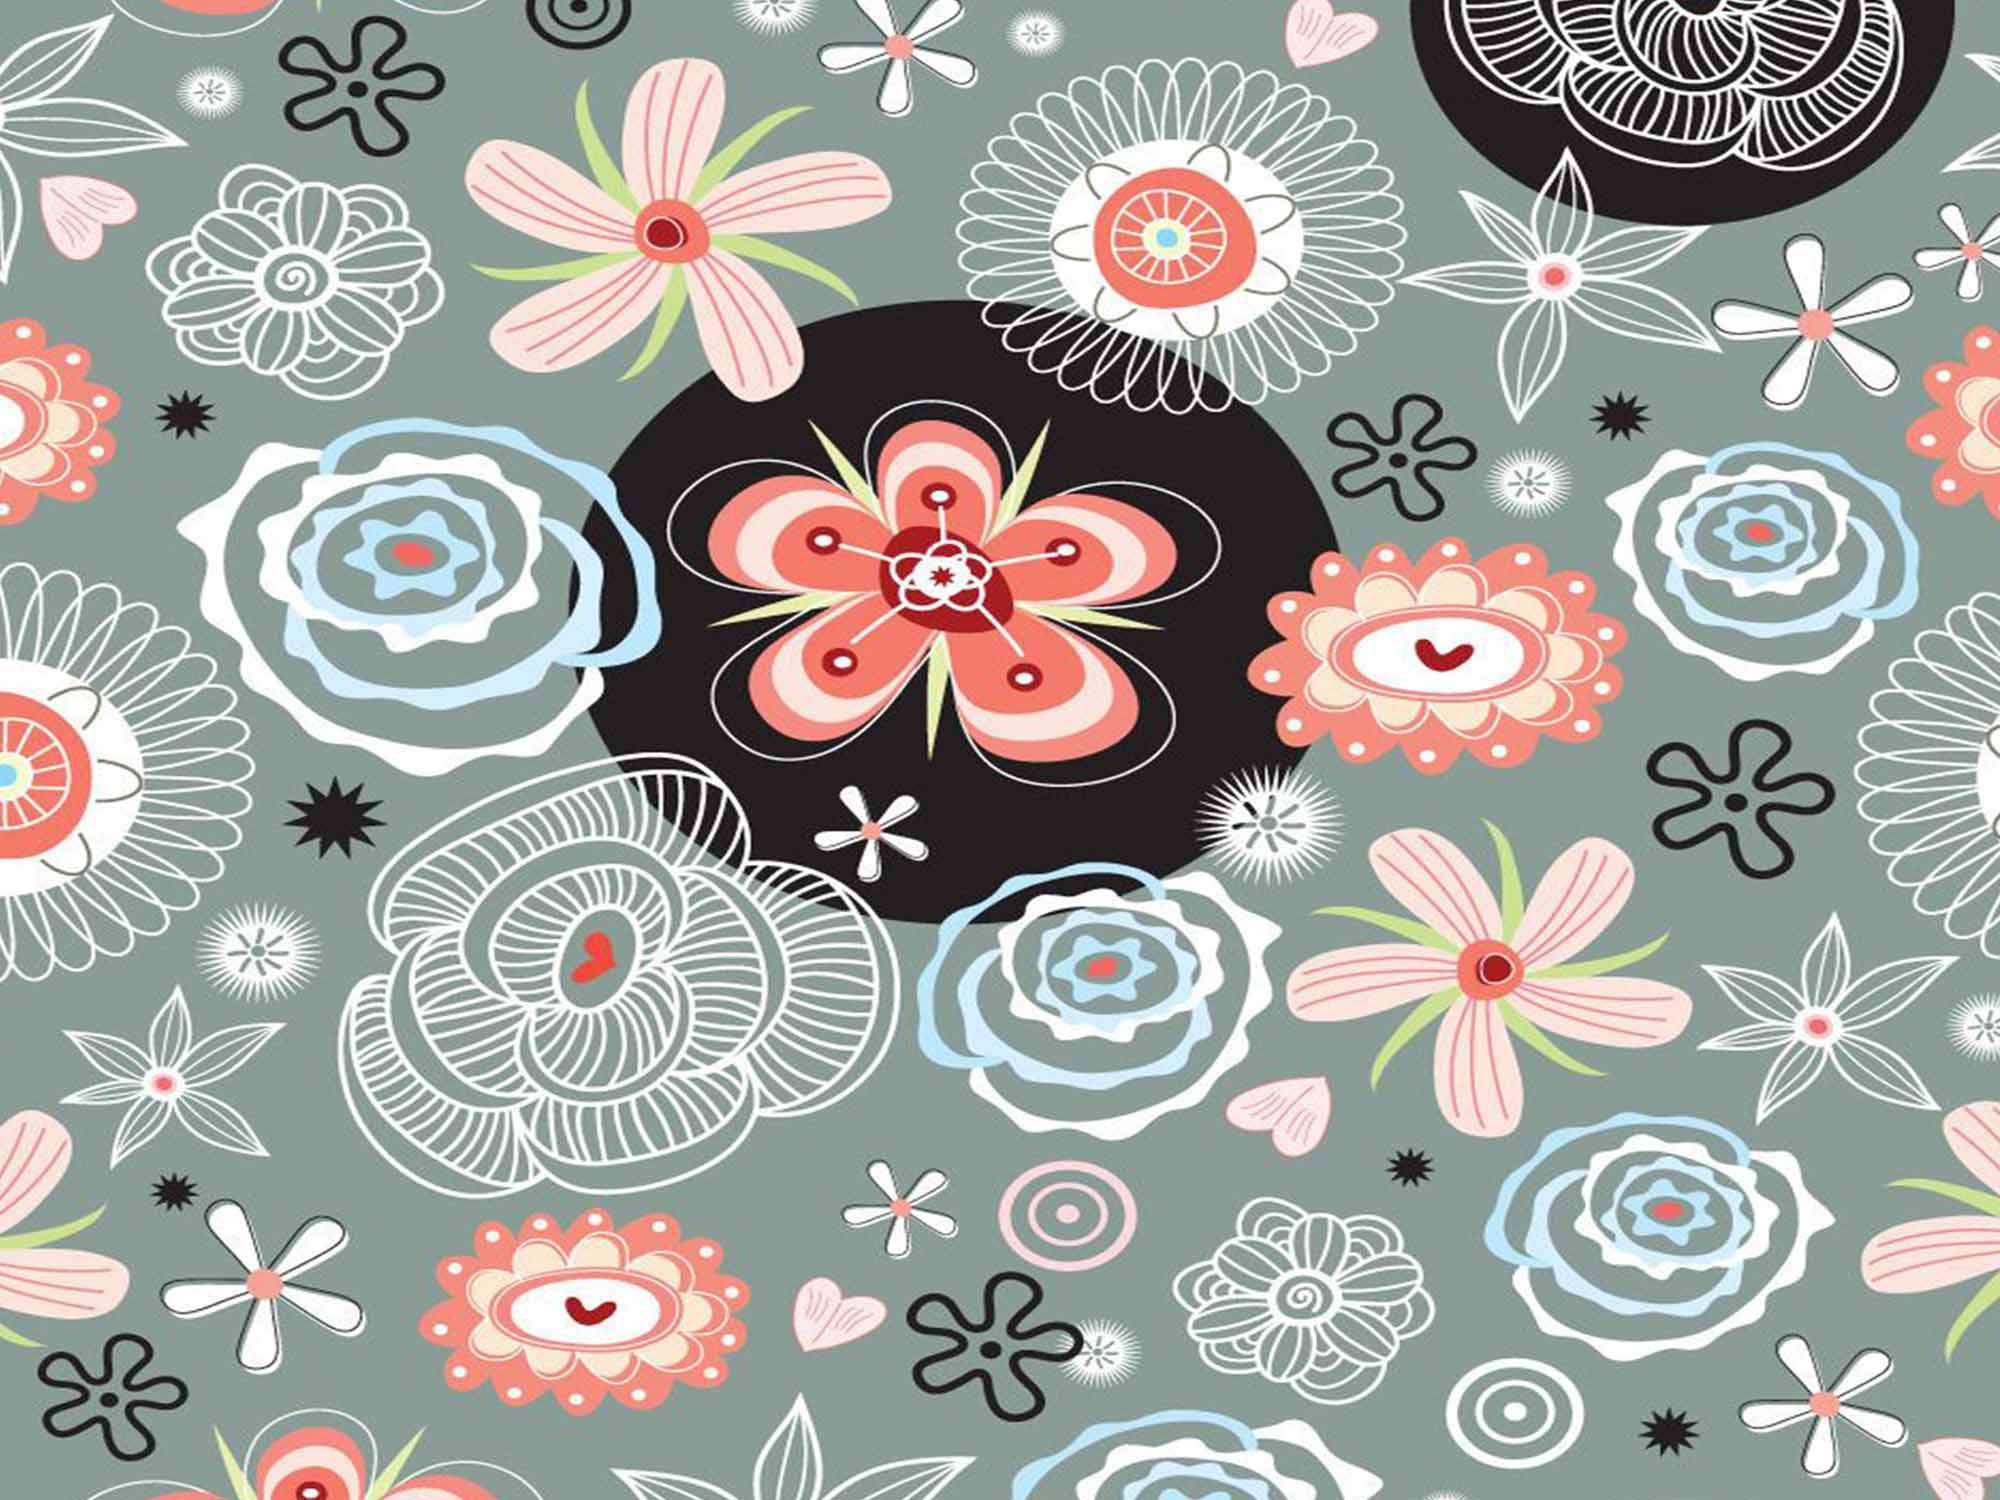 Papel de Parede Floral 0035 - Adesivos de Parede  - Paredes Decoradas